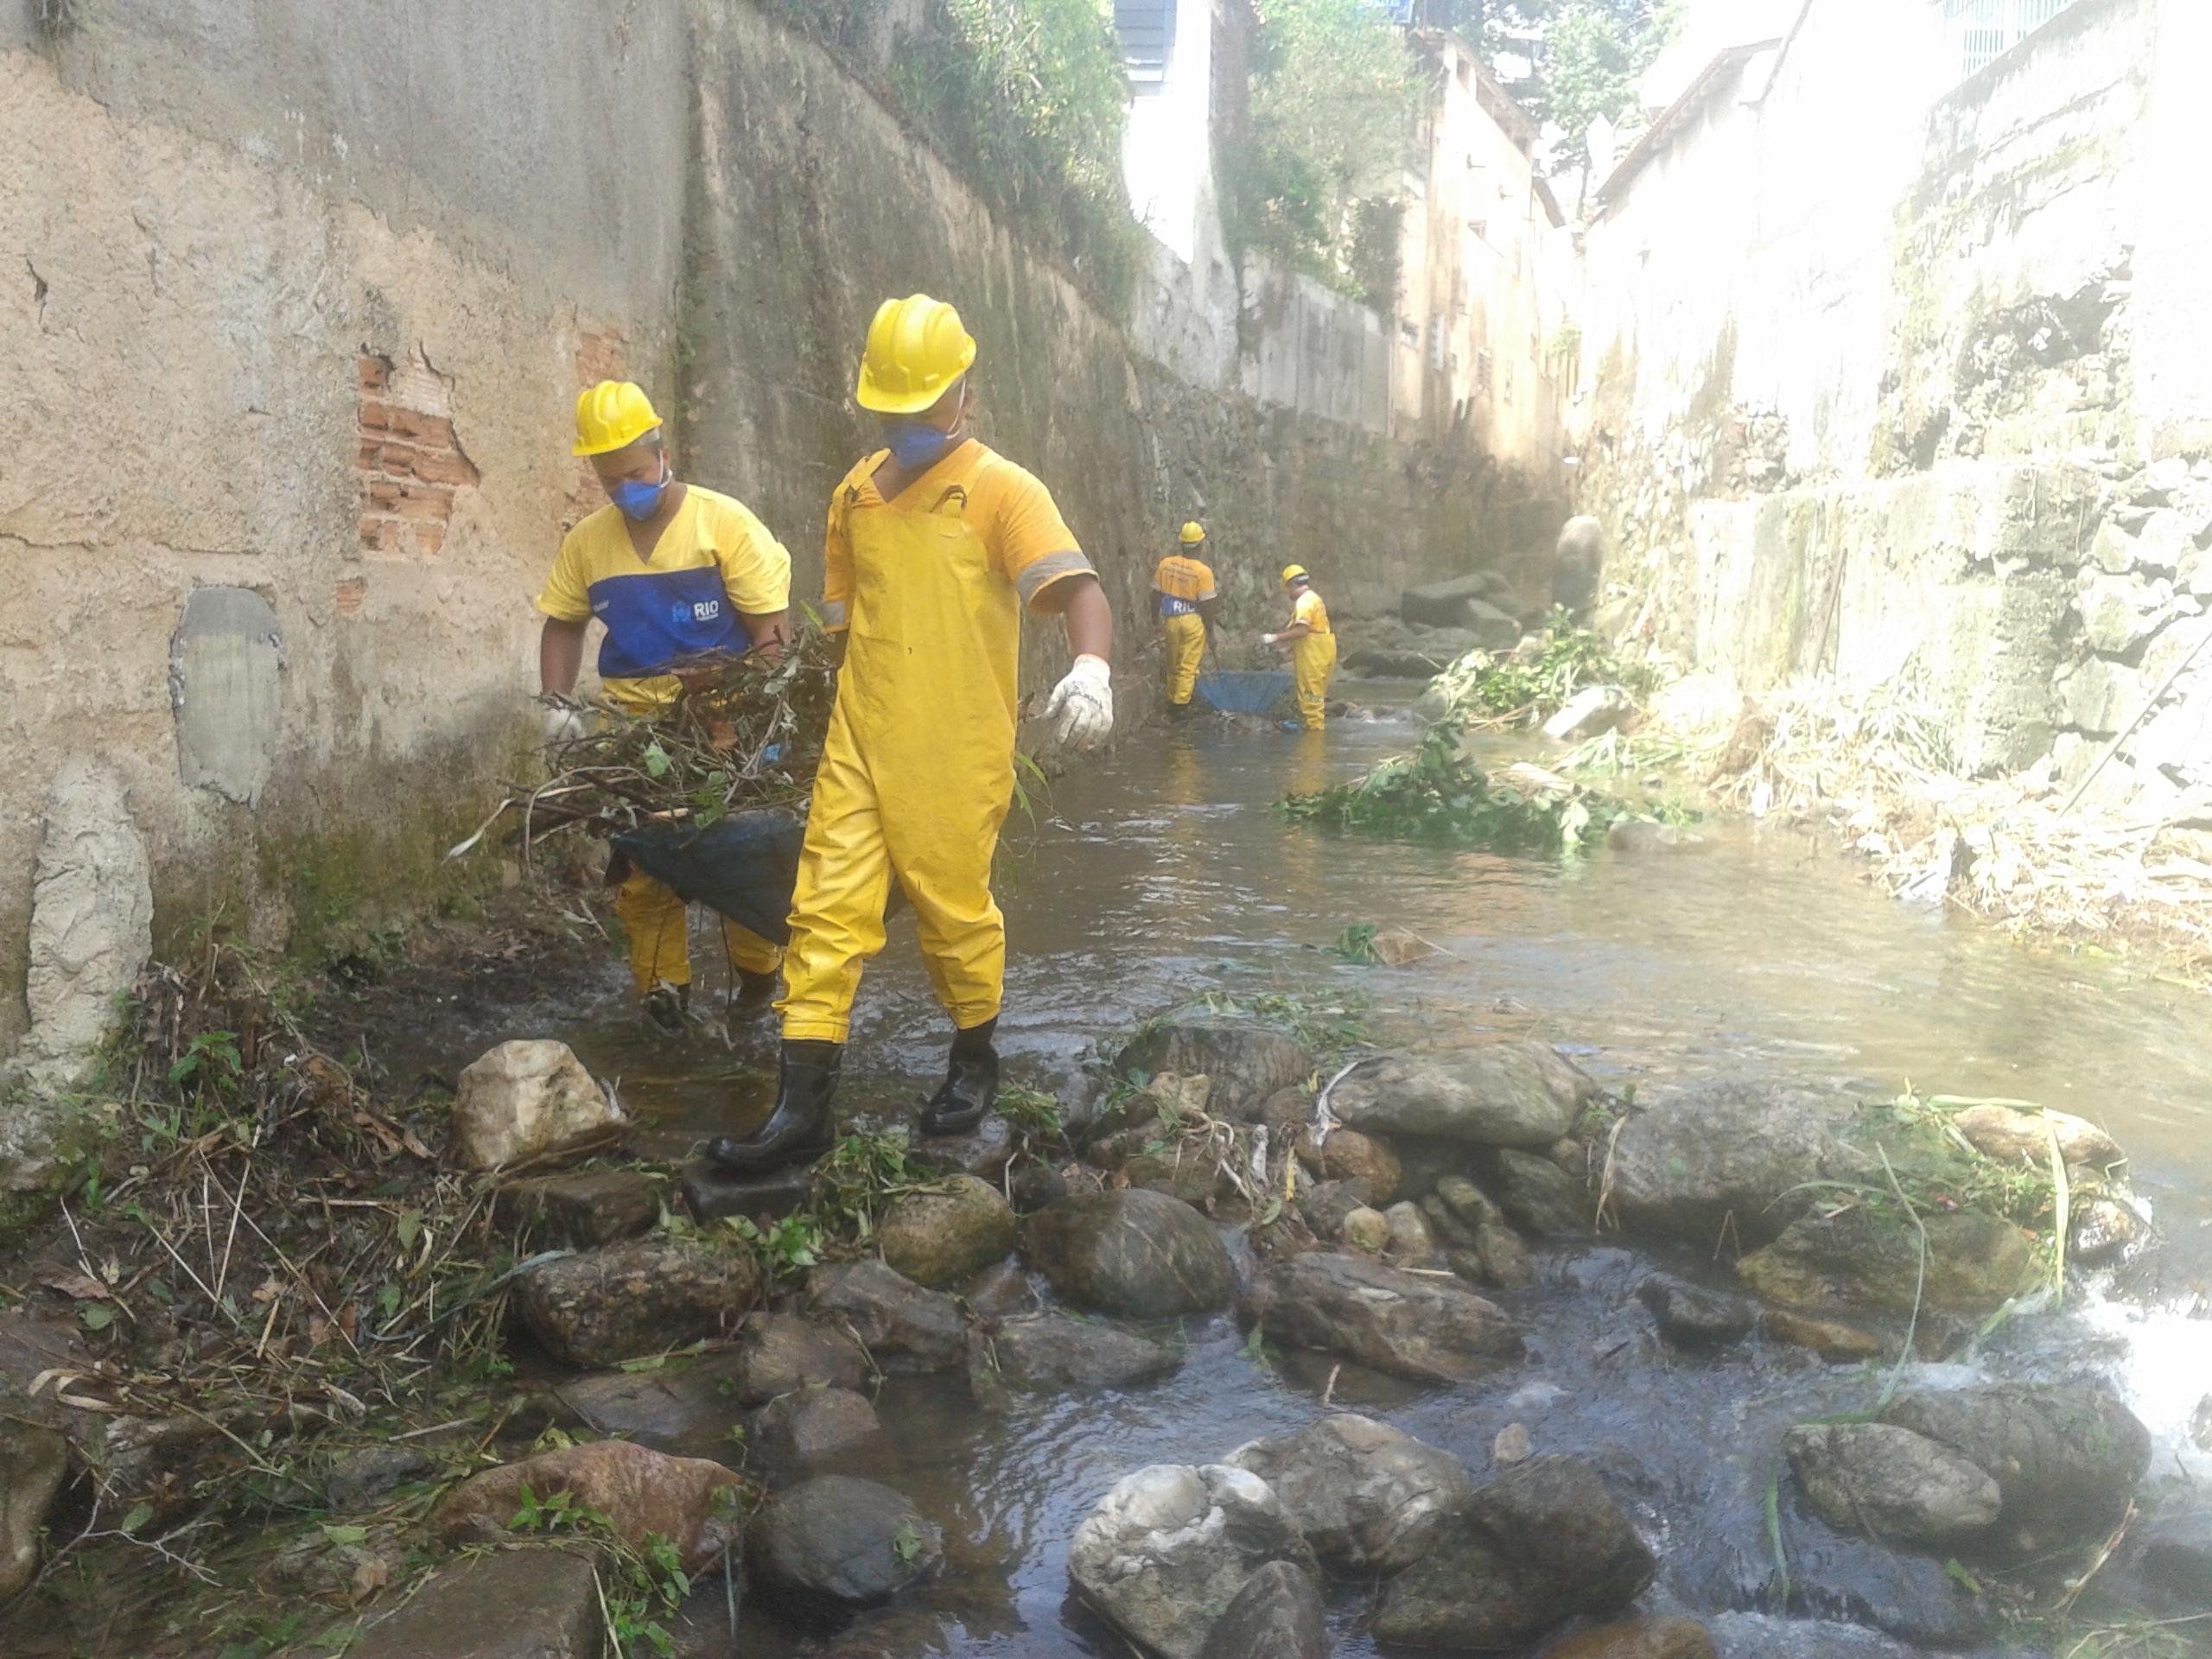 Rio-Águas trabalha na limpeza do Rio Maracanã